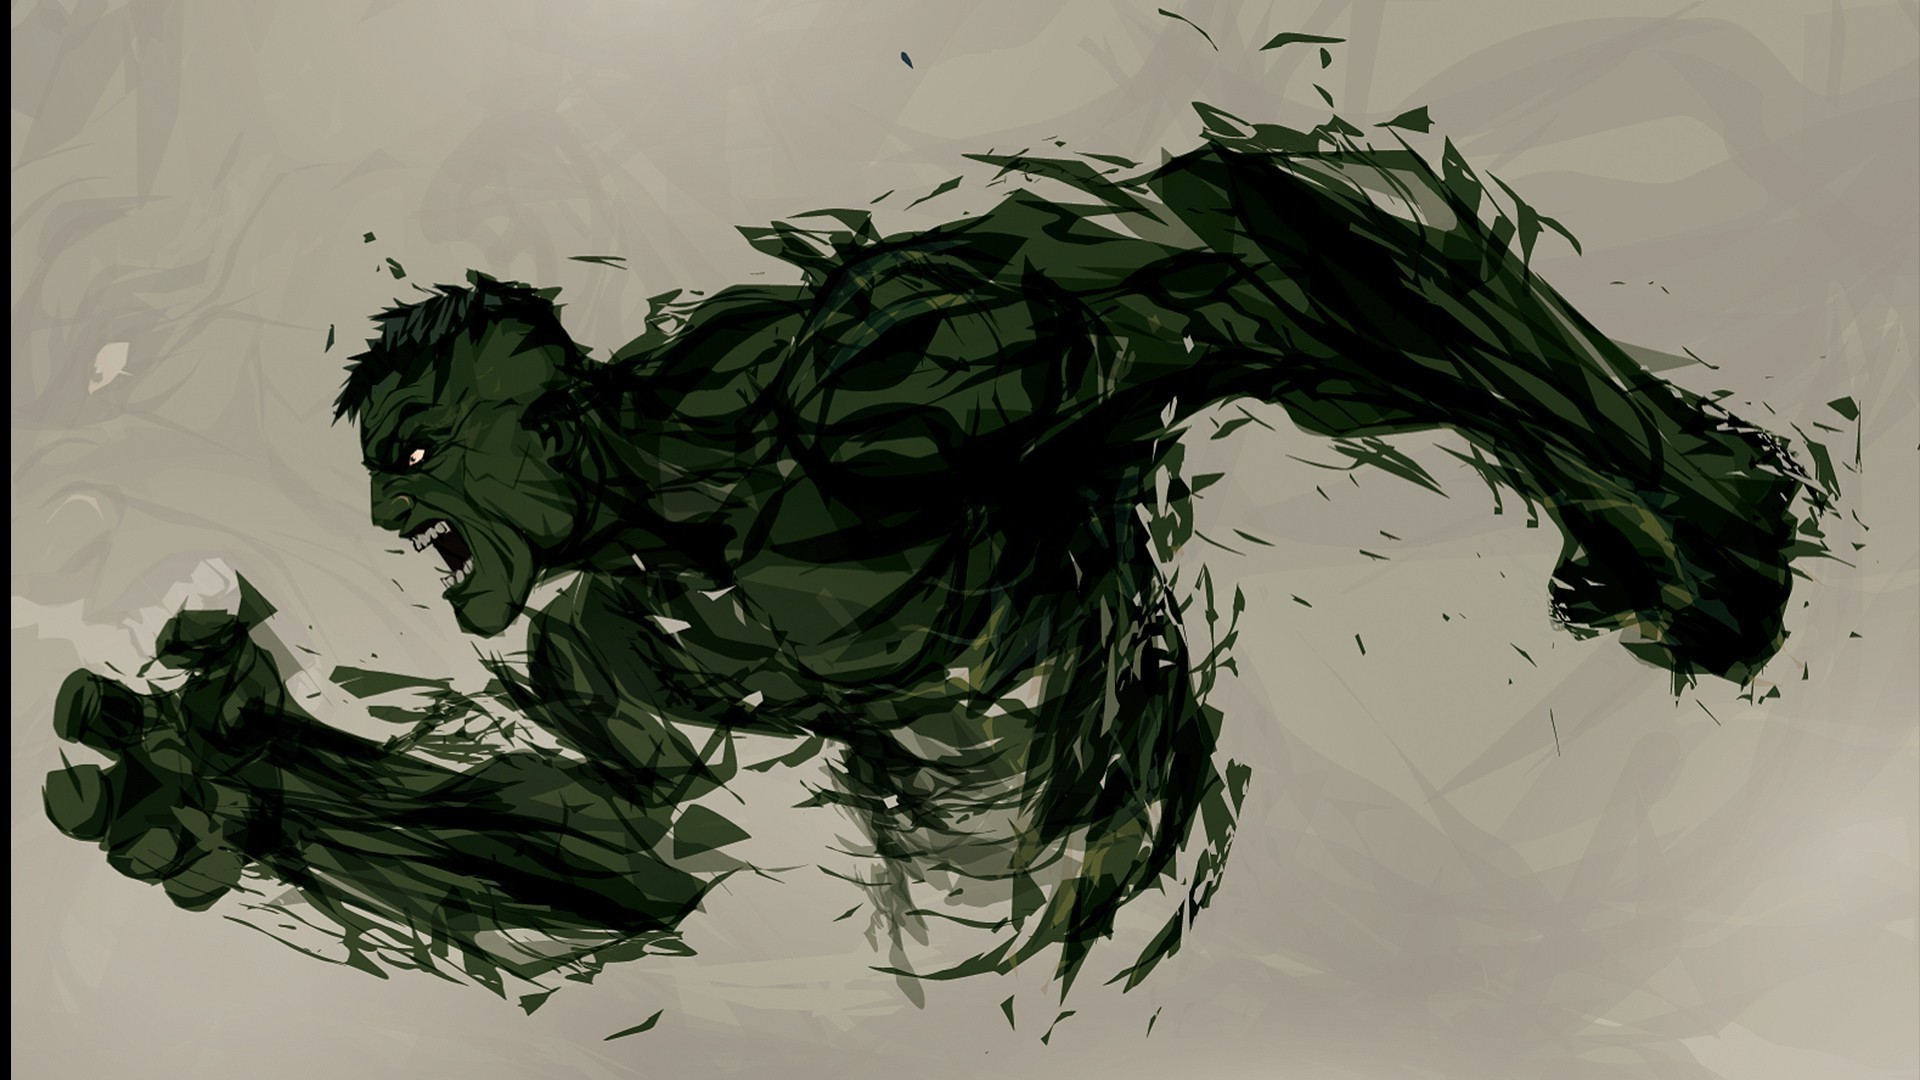 Hulk Avengers Hd Wallpapers 1080p